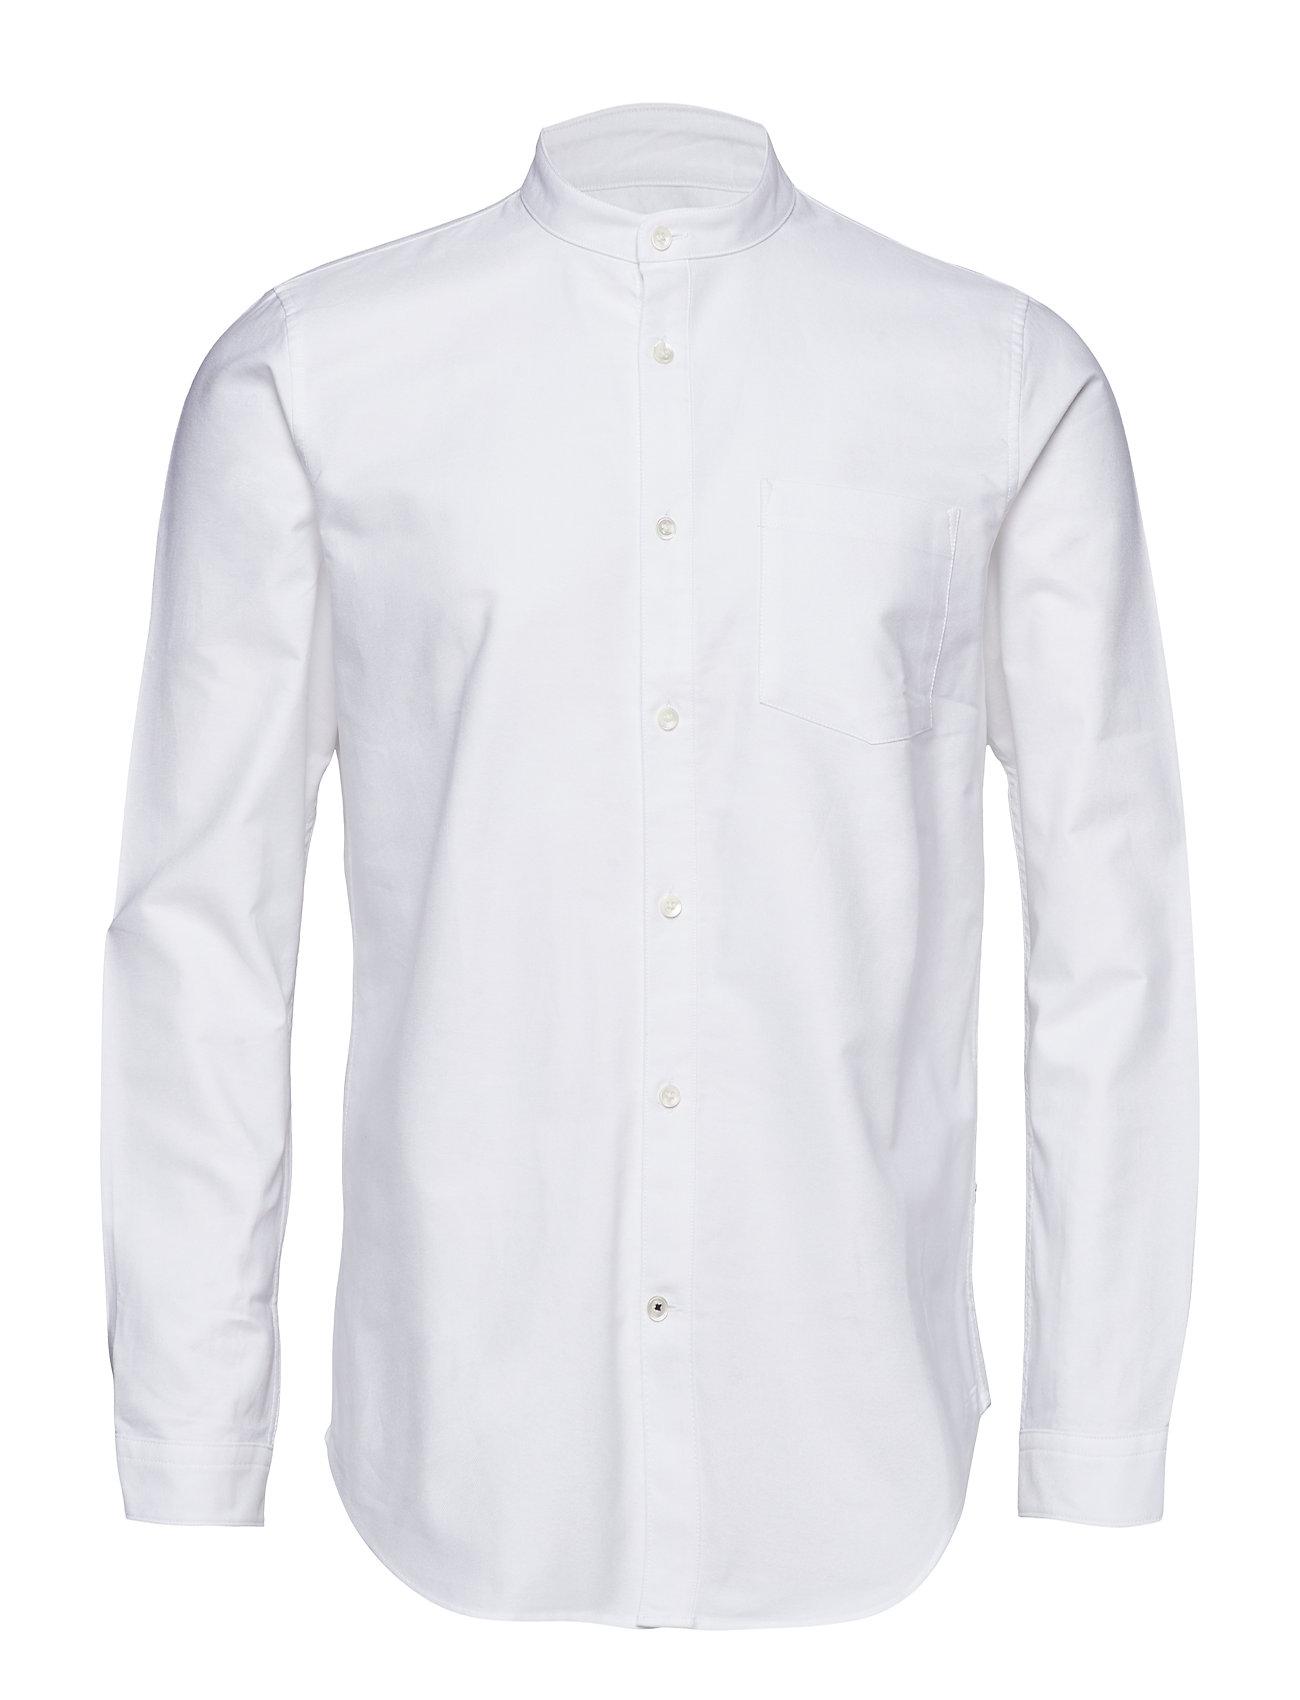 NN07 Eske 5910 - WHITE